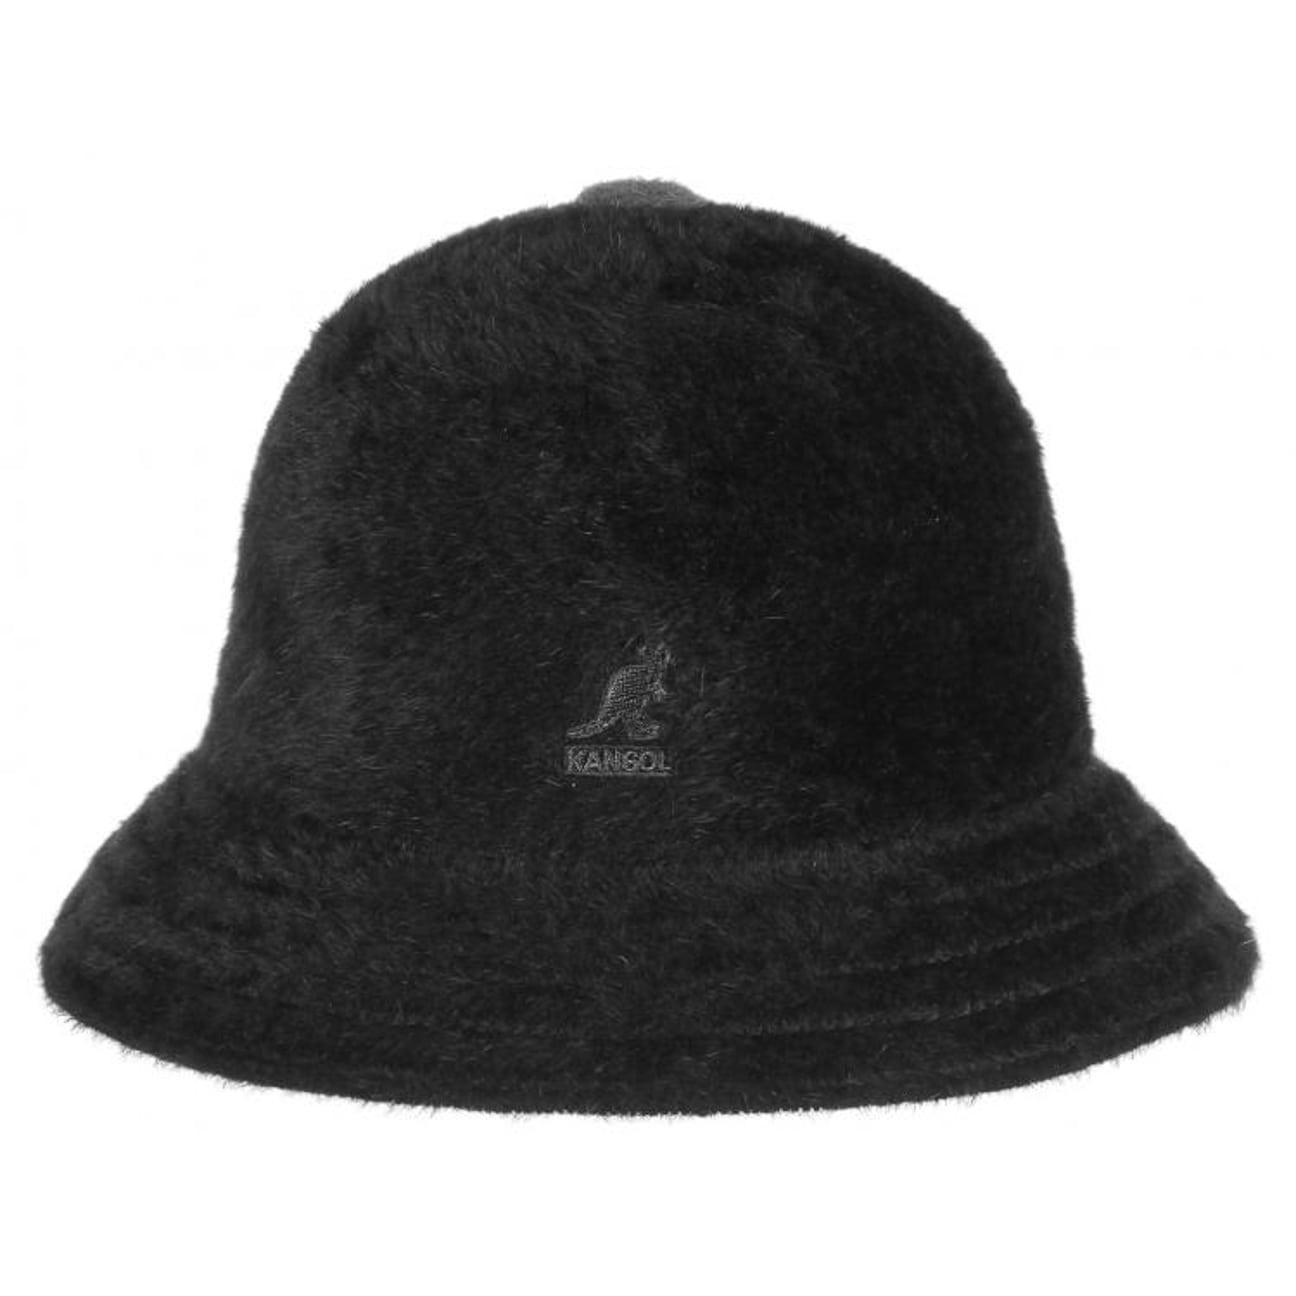 ... Shavora Casual Angora Hat by Kangol - black 1 32a38679ddf